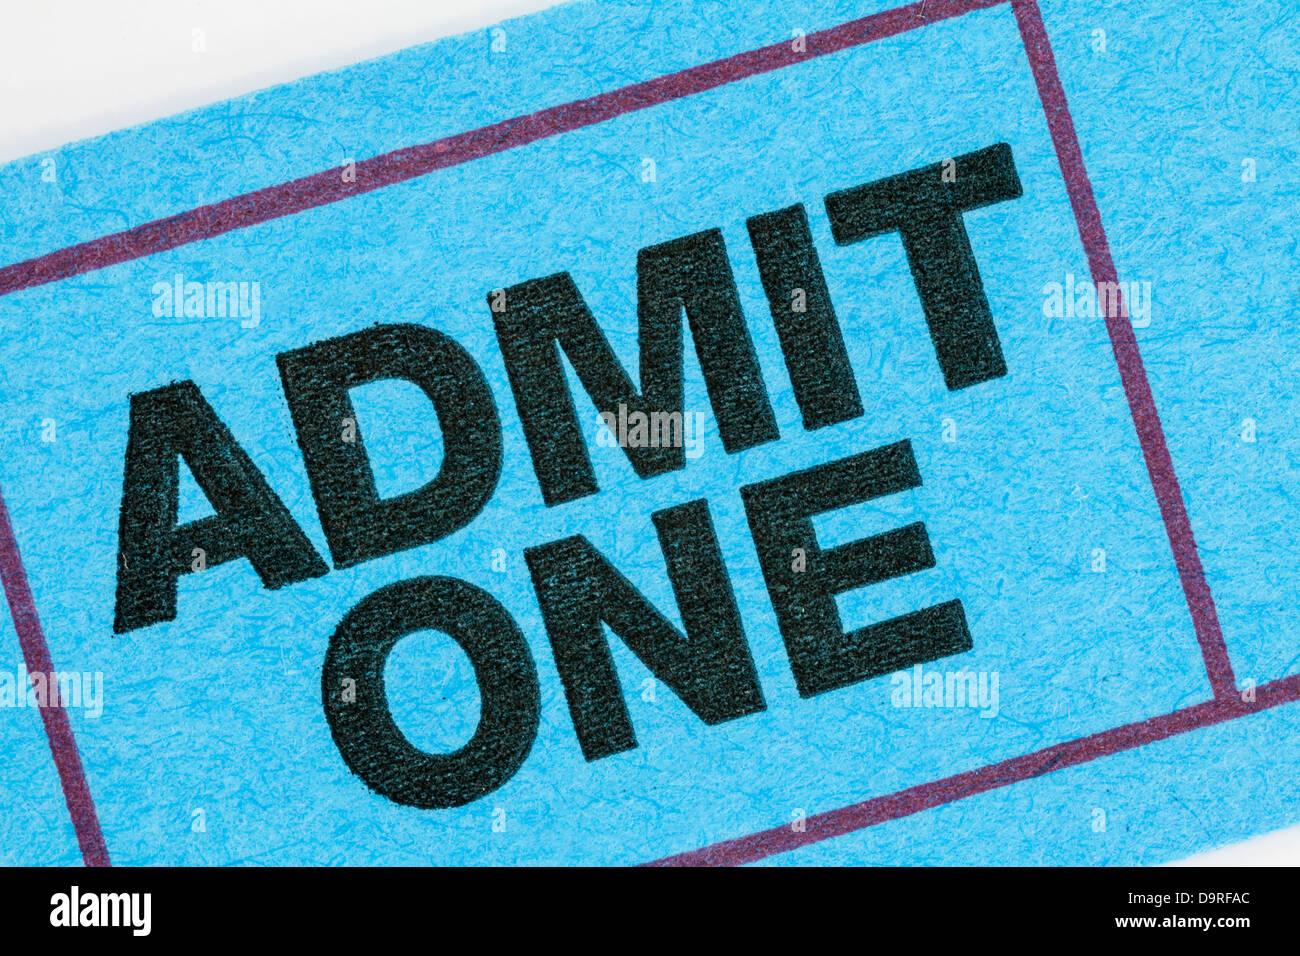 Generic ticket stub macro detail. - Stock Image